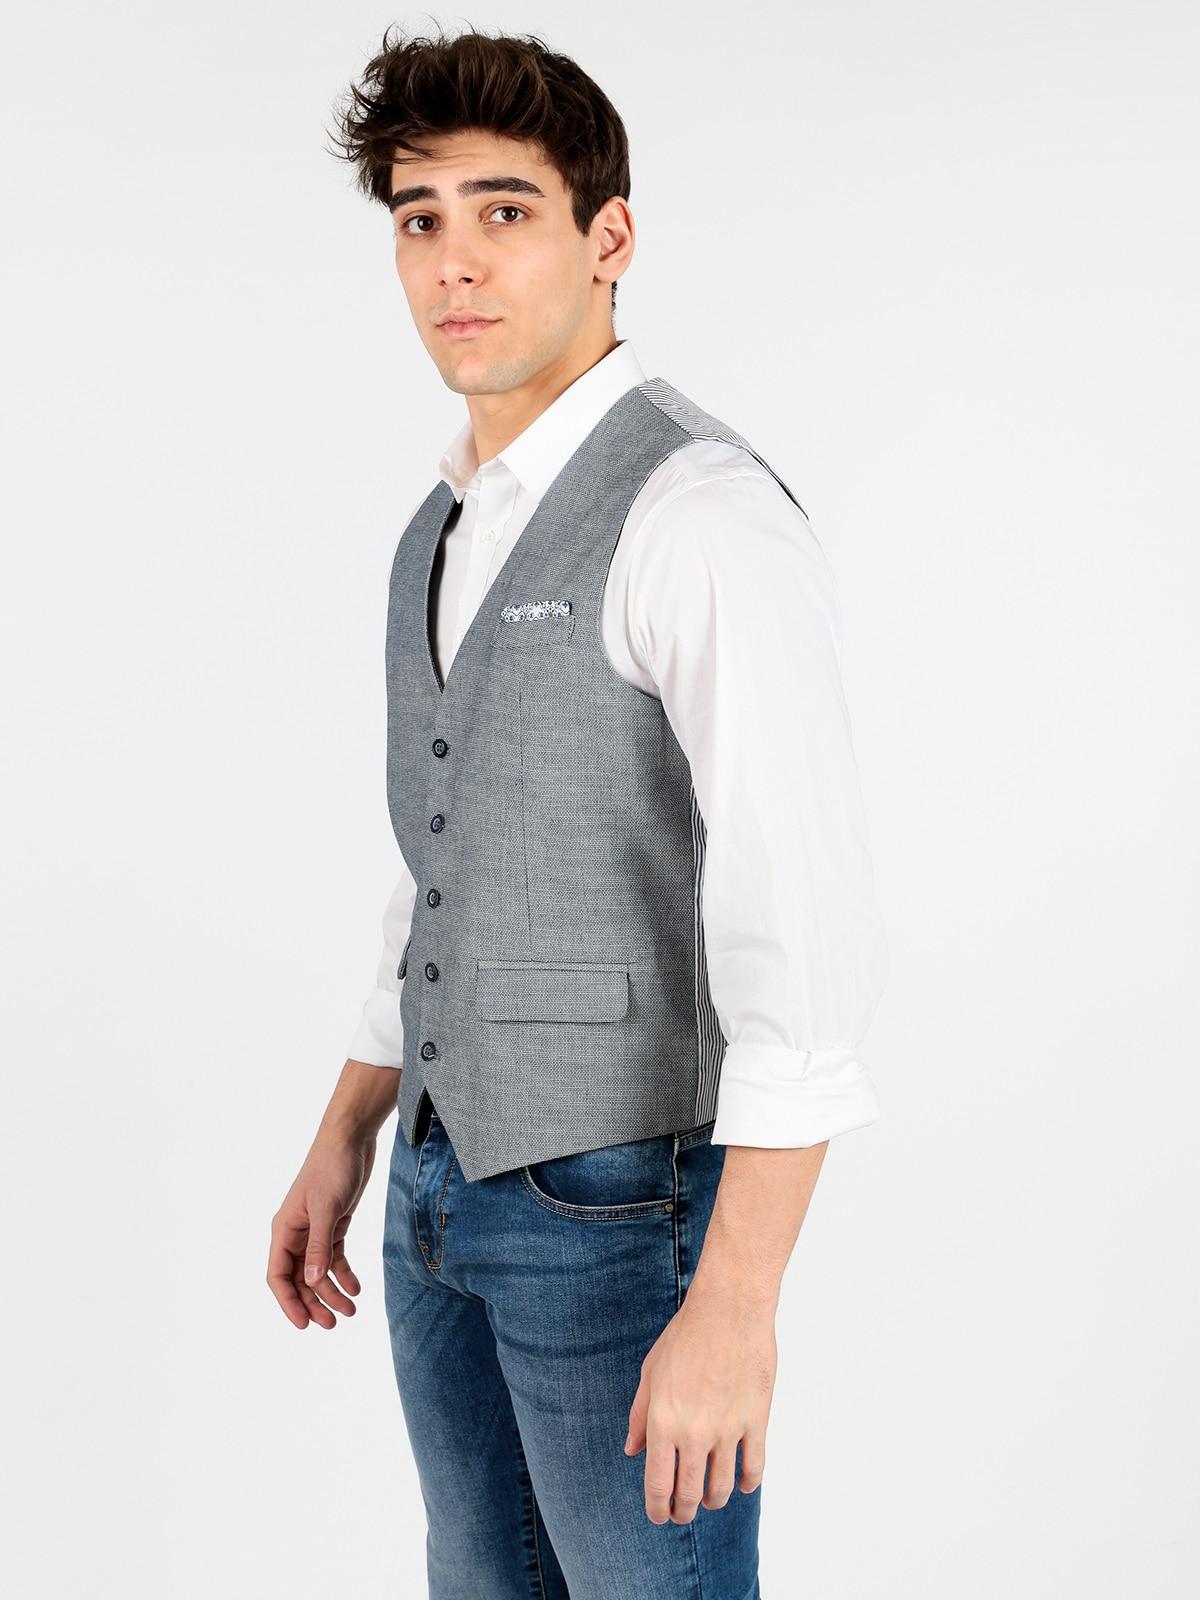 Elegant Vest Men